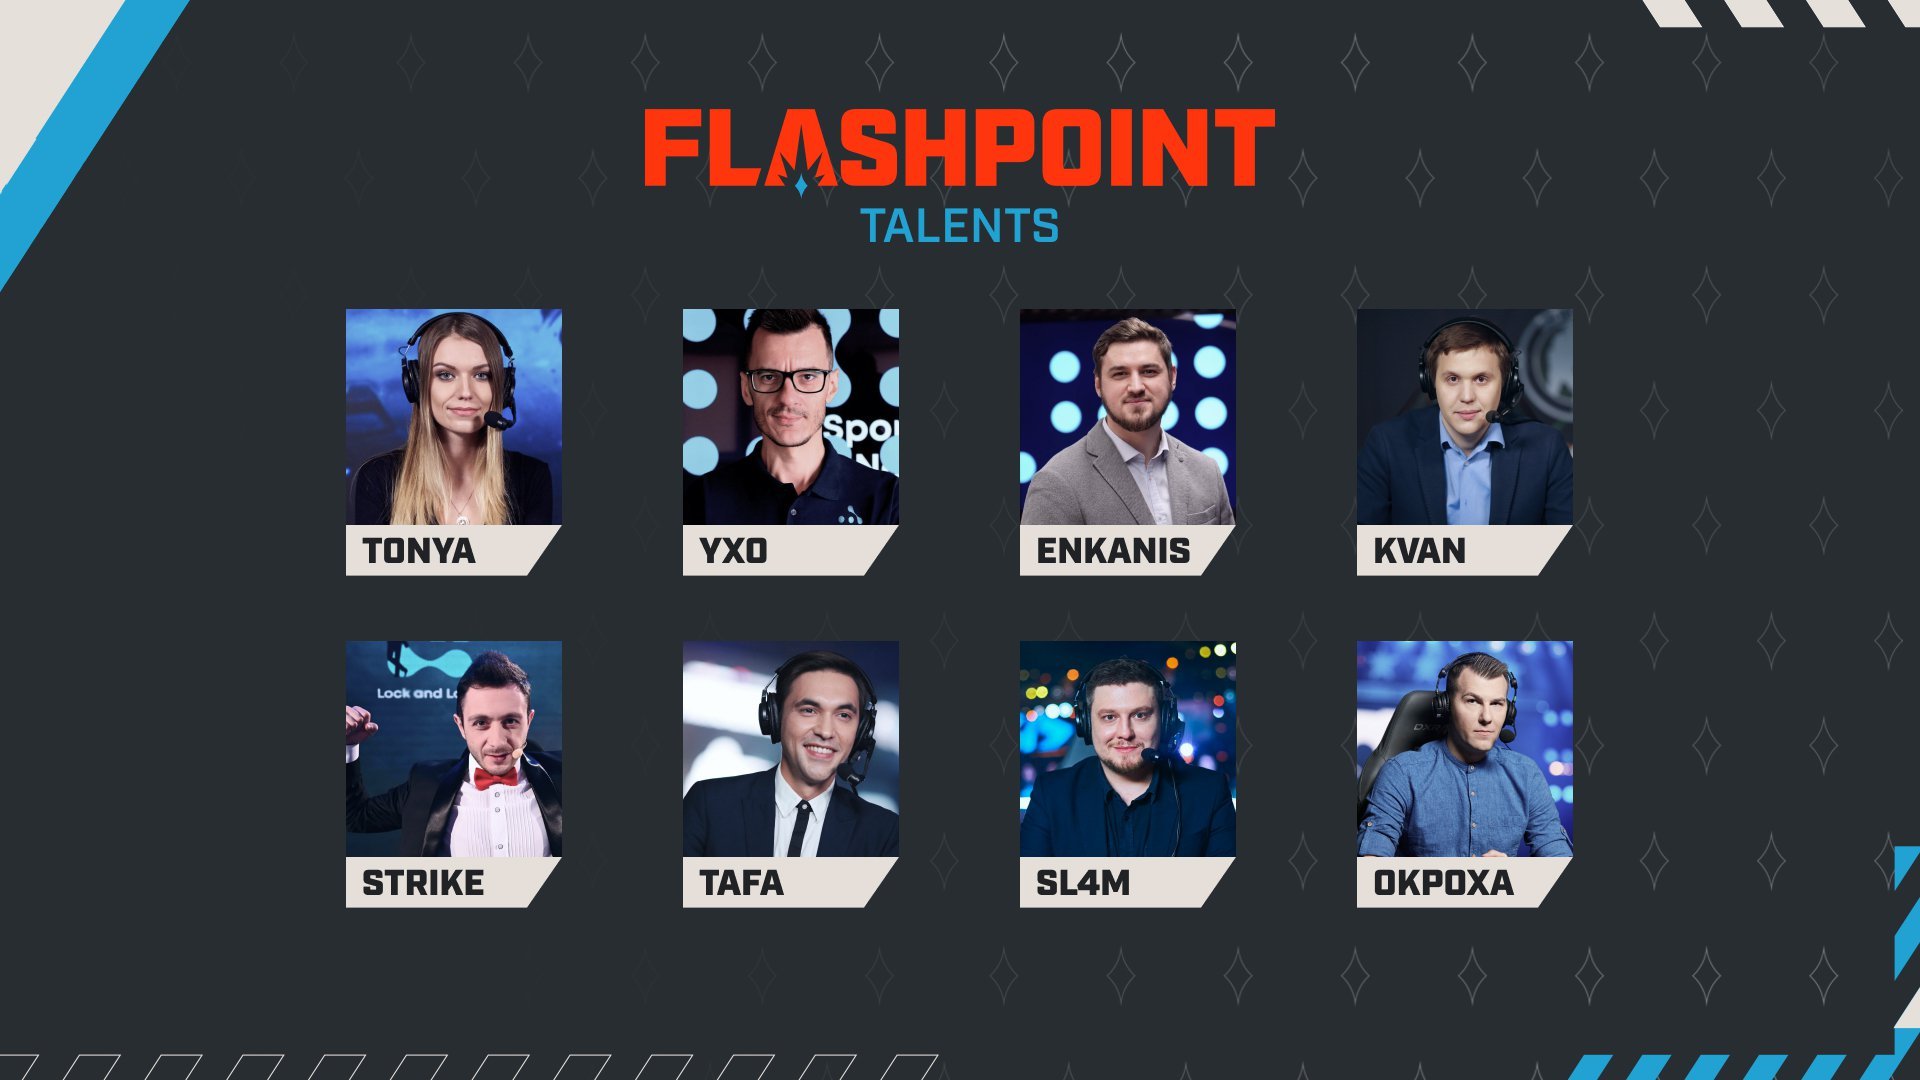 Flashpoint Season 3 Russian-Speaking talent crew announced